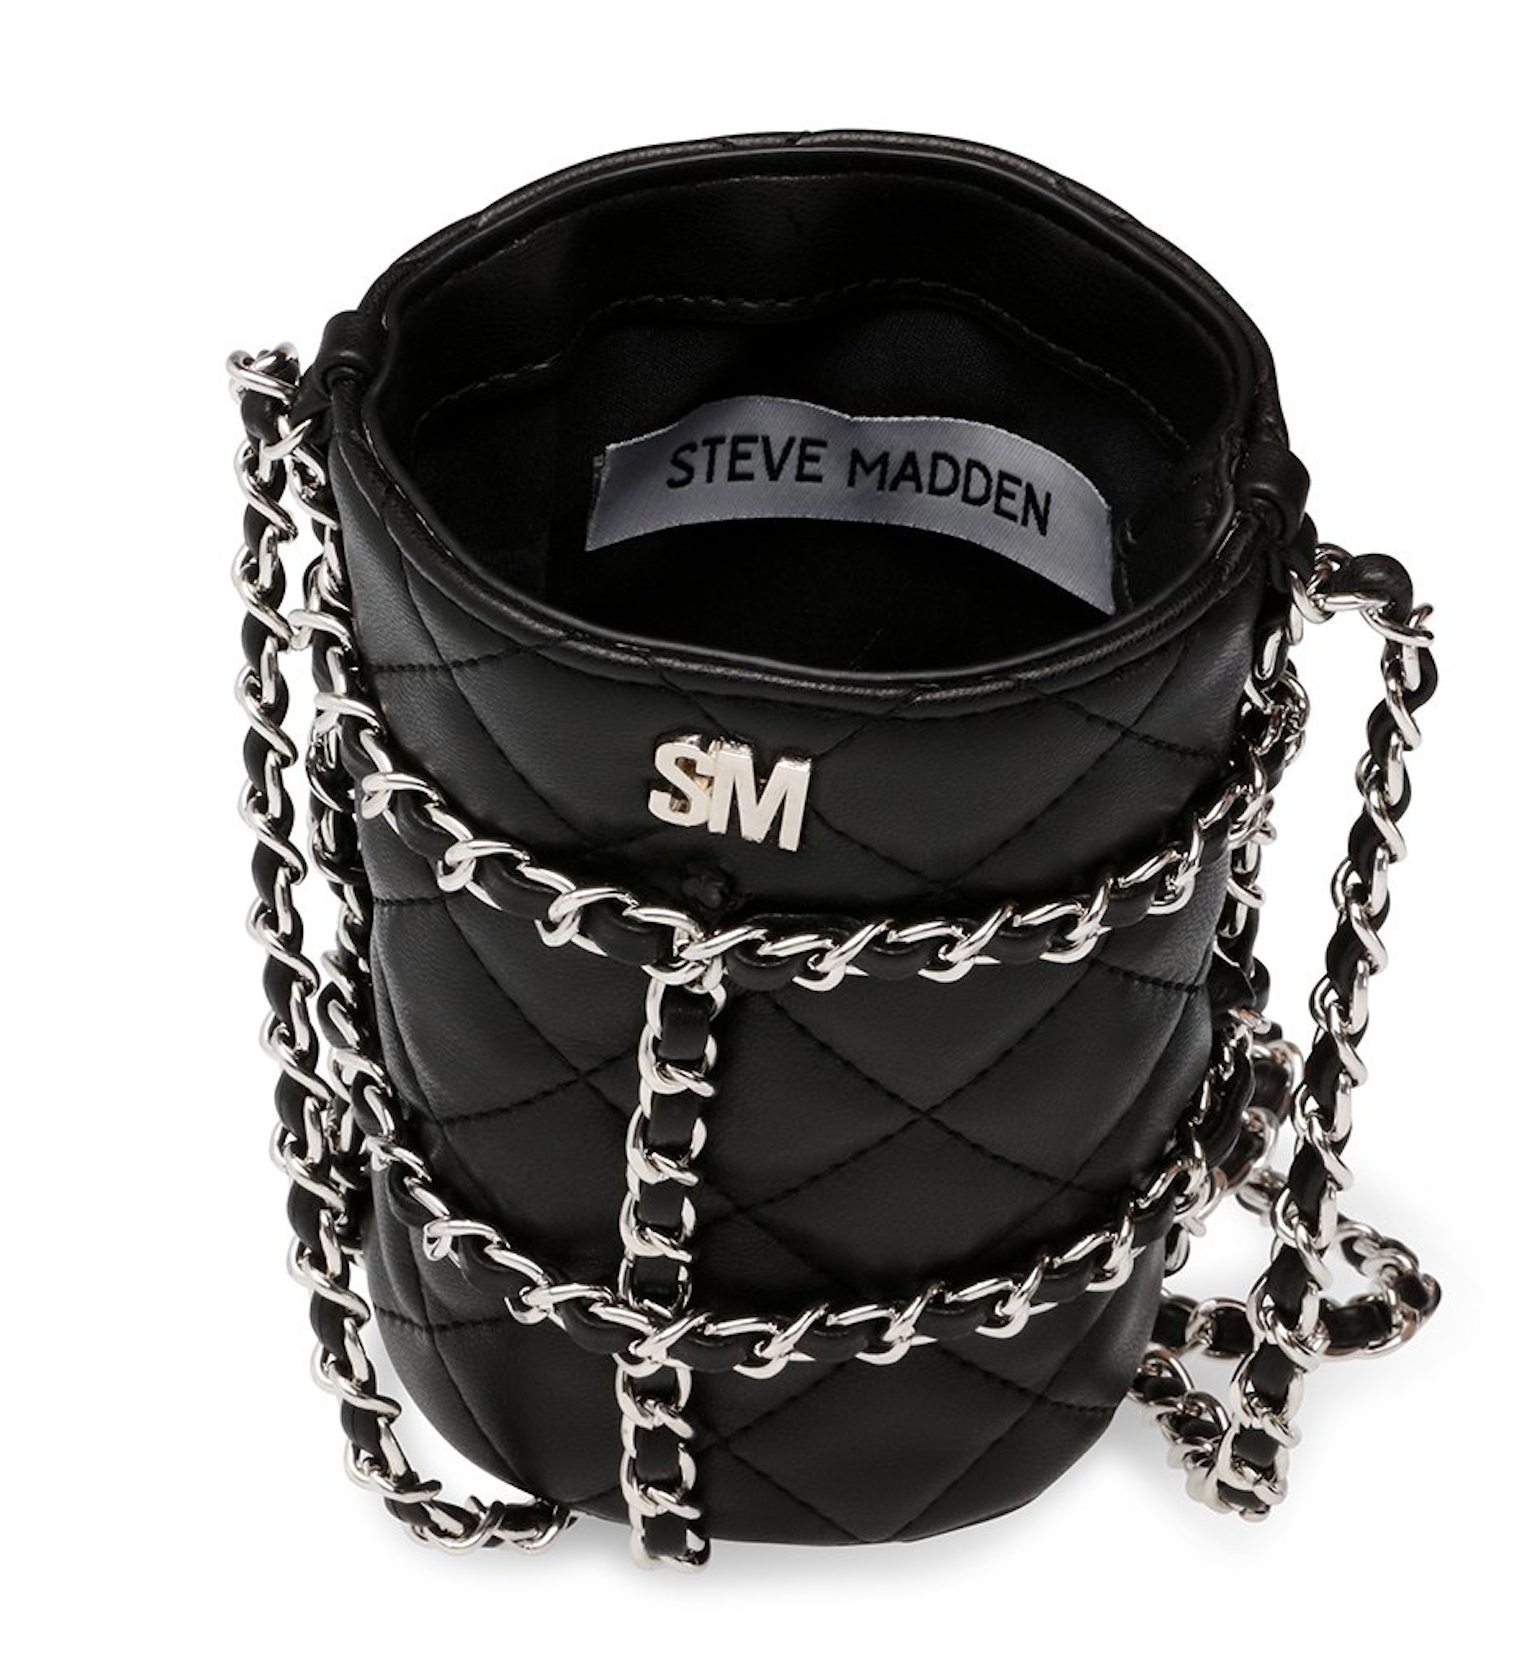 STEVE MADDEN BQUENCH Black